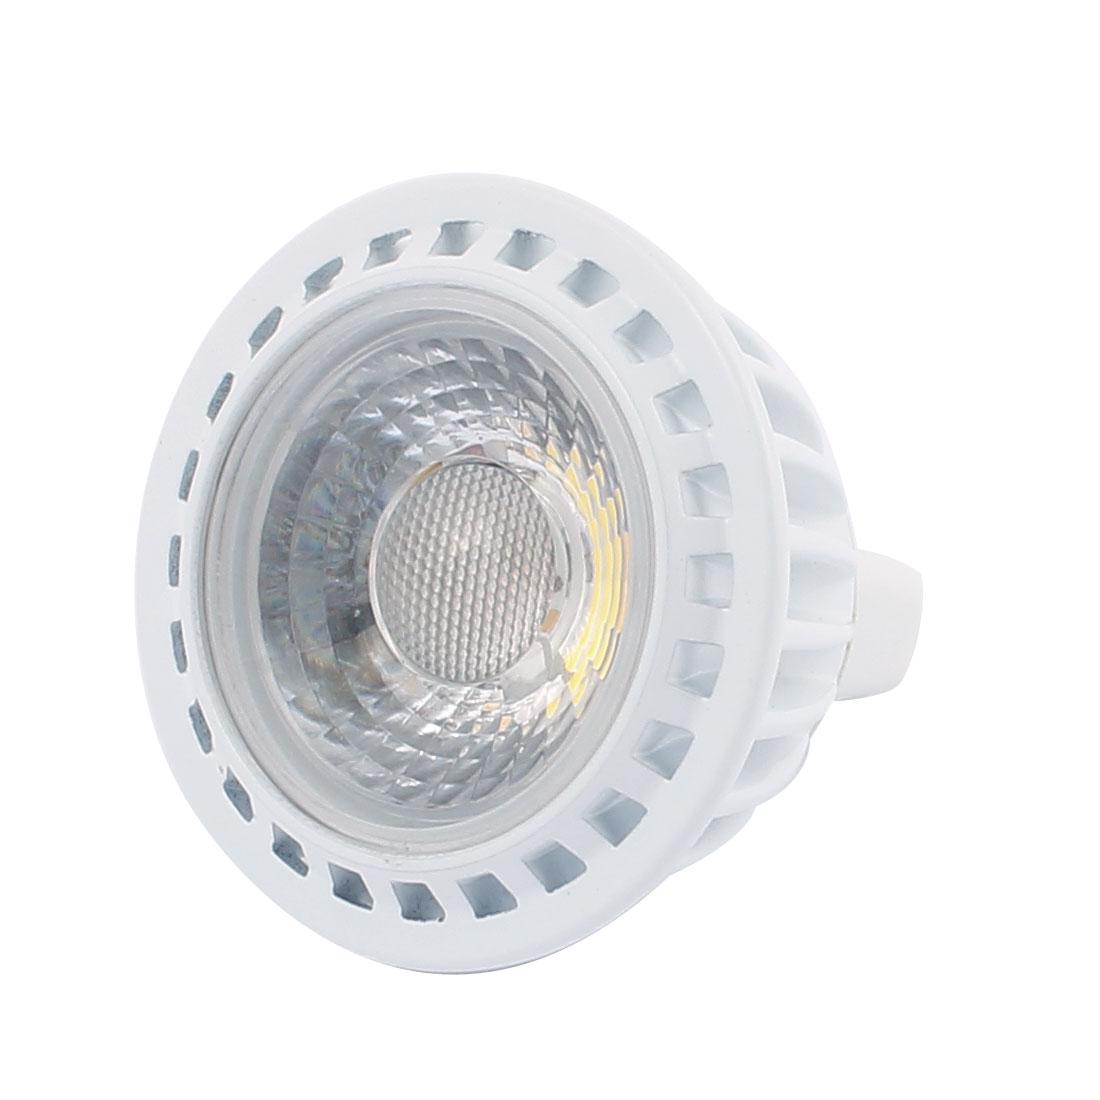 DC12V 5W MR16 COB LED Spotlight Lamp Bulb Energy Saving Downlight Pure White